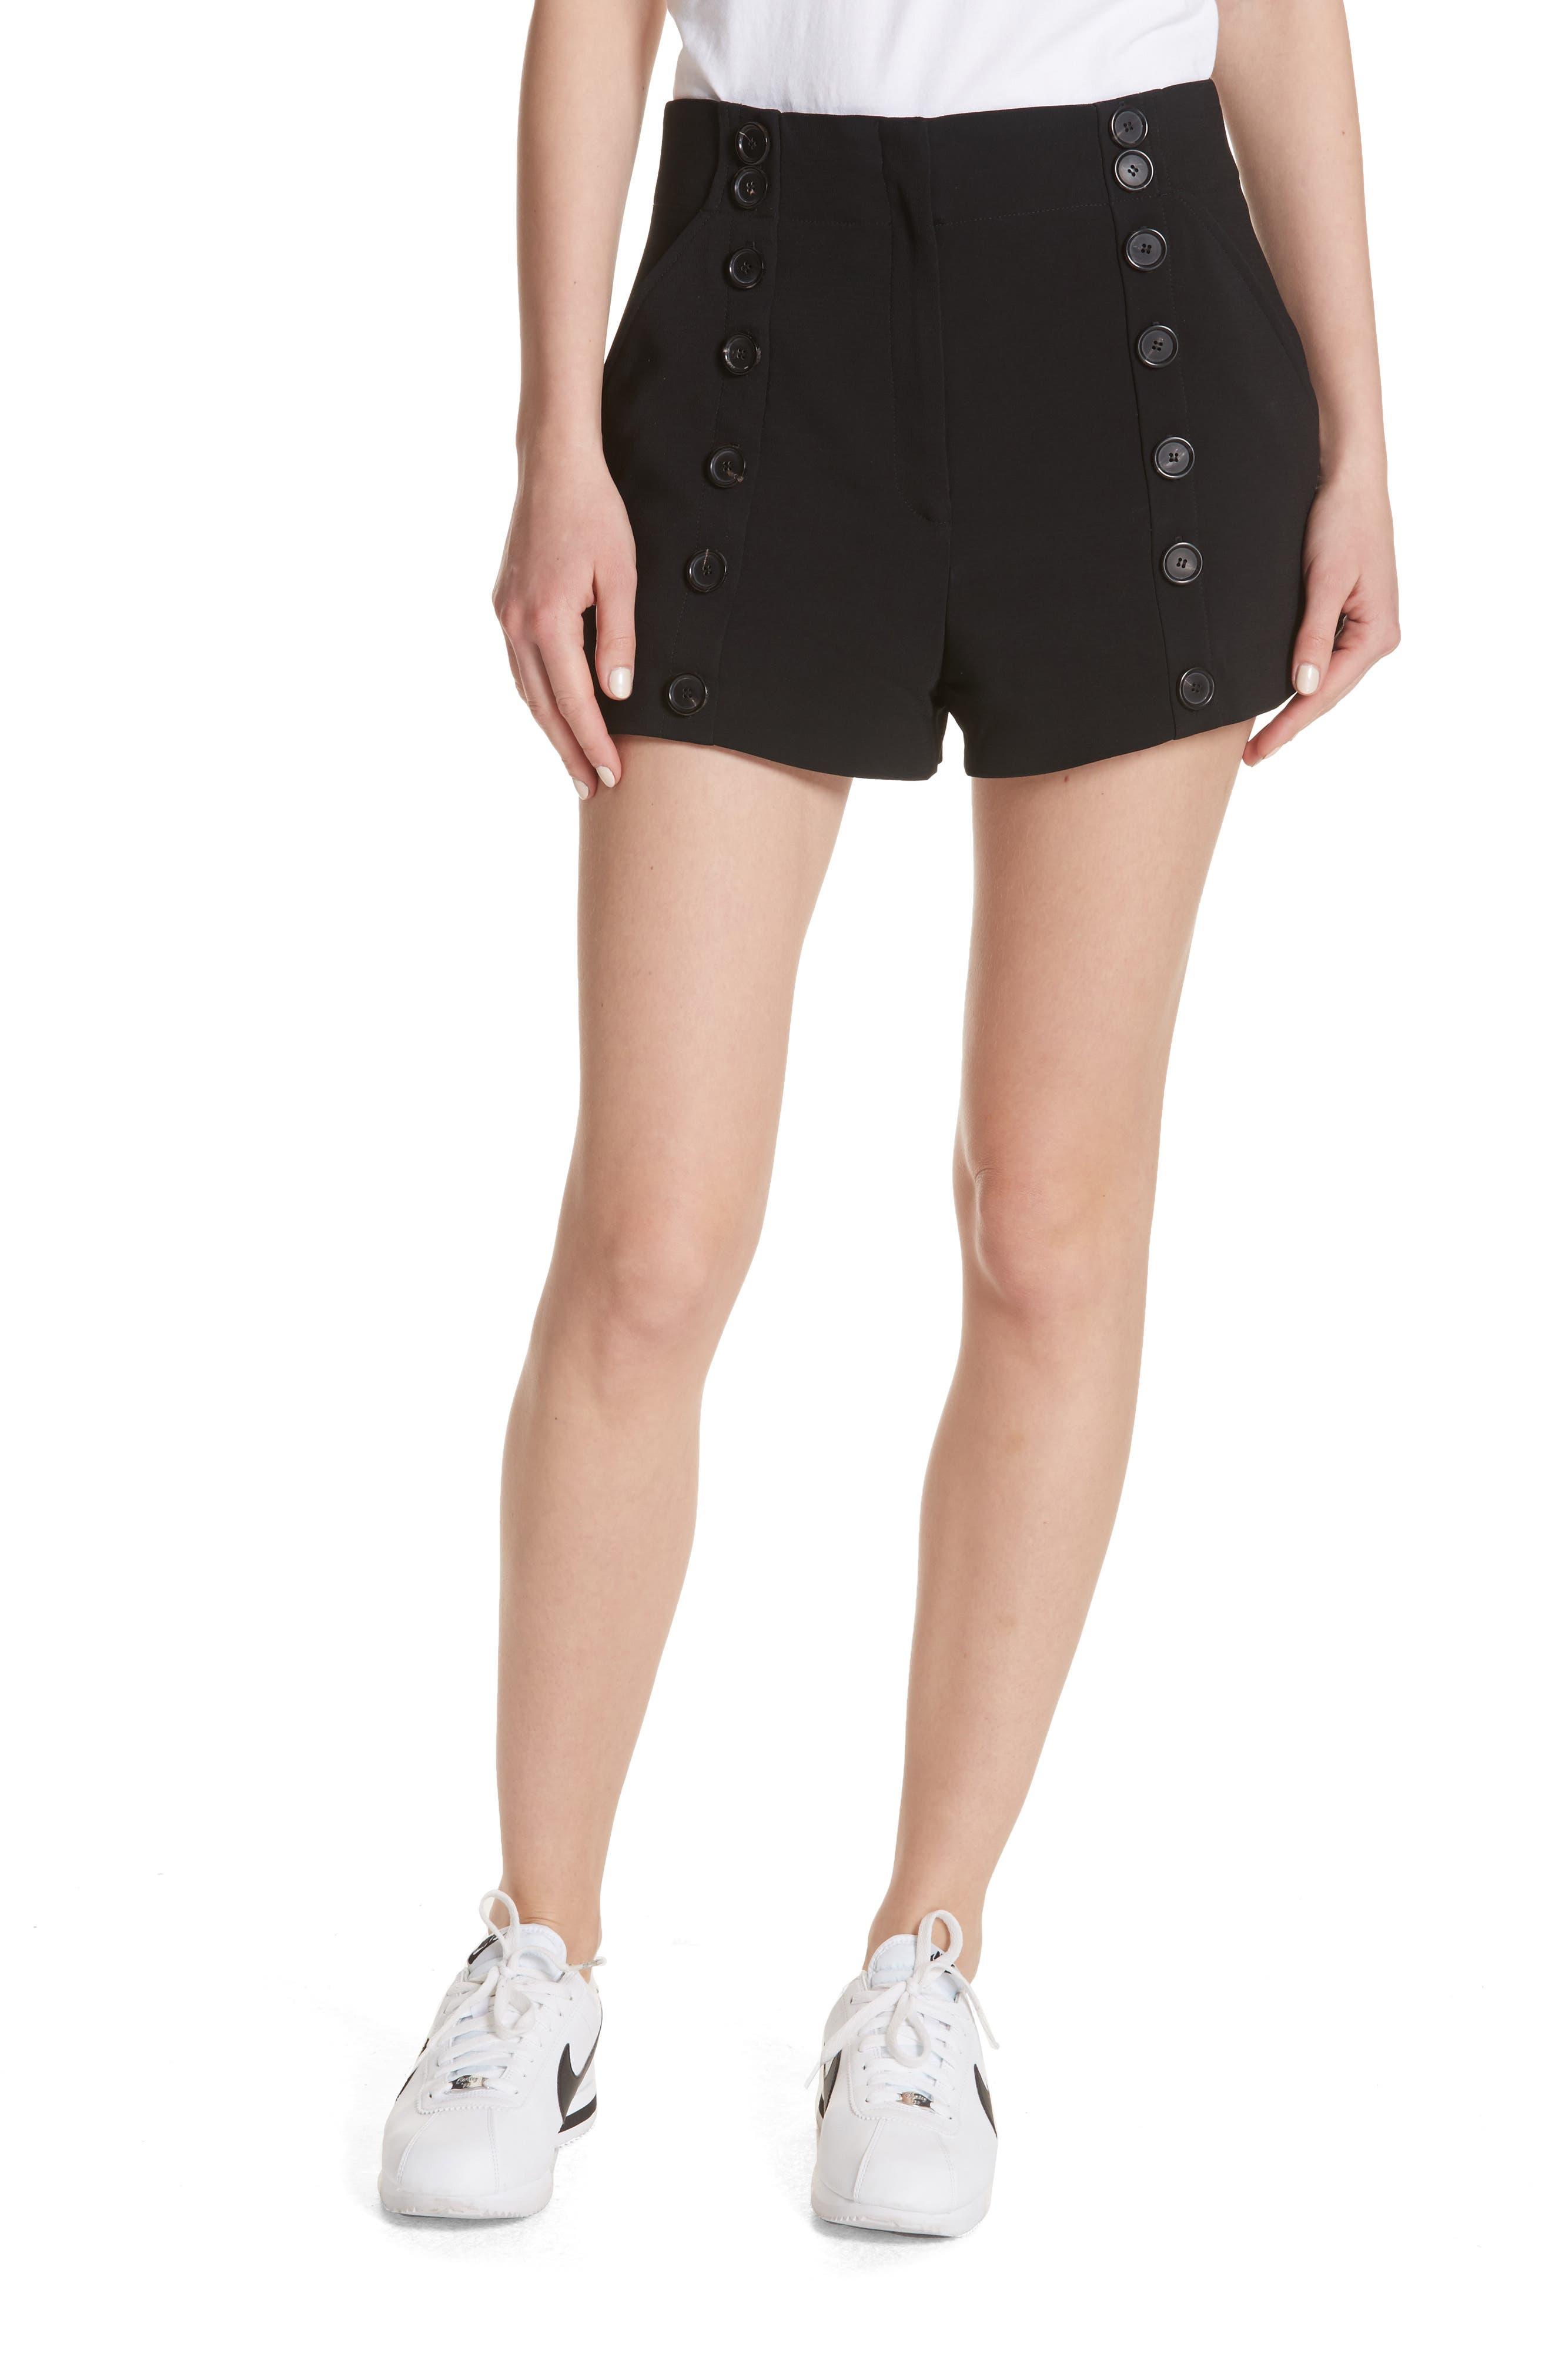 Issac Shorts,                         Main,                         color, Black